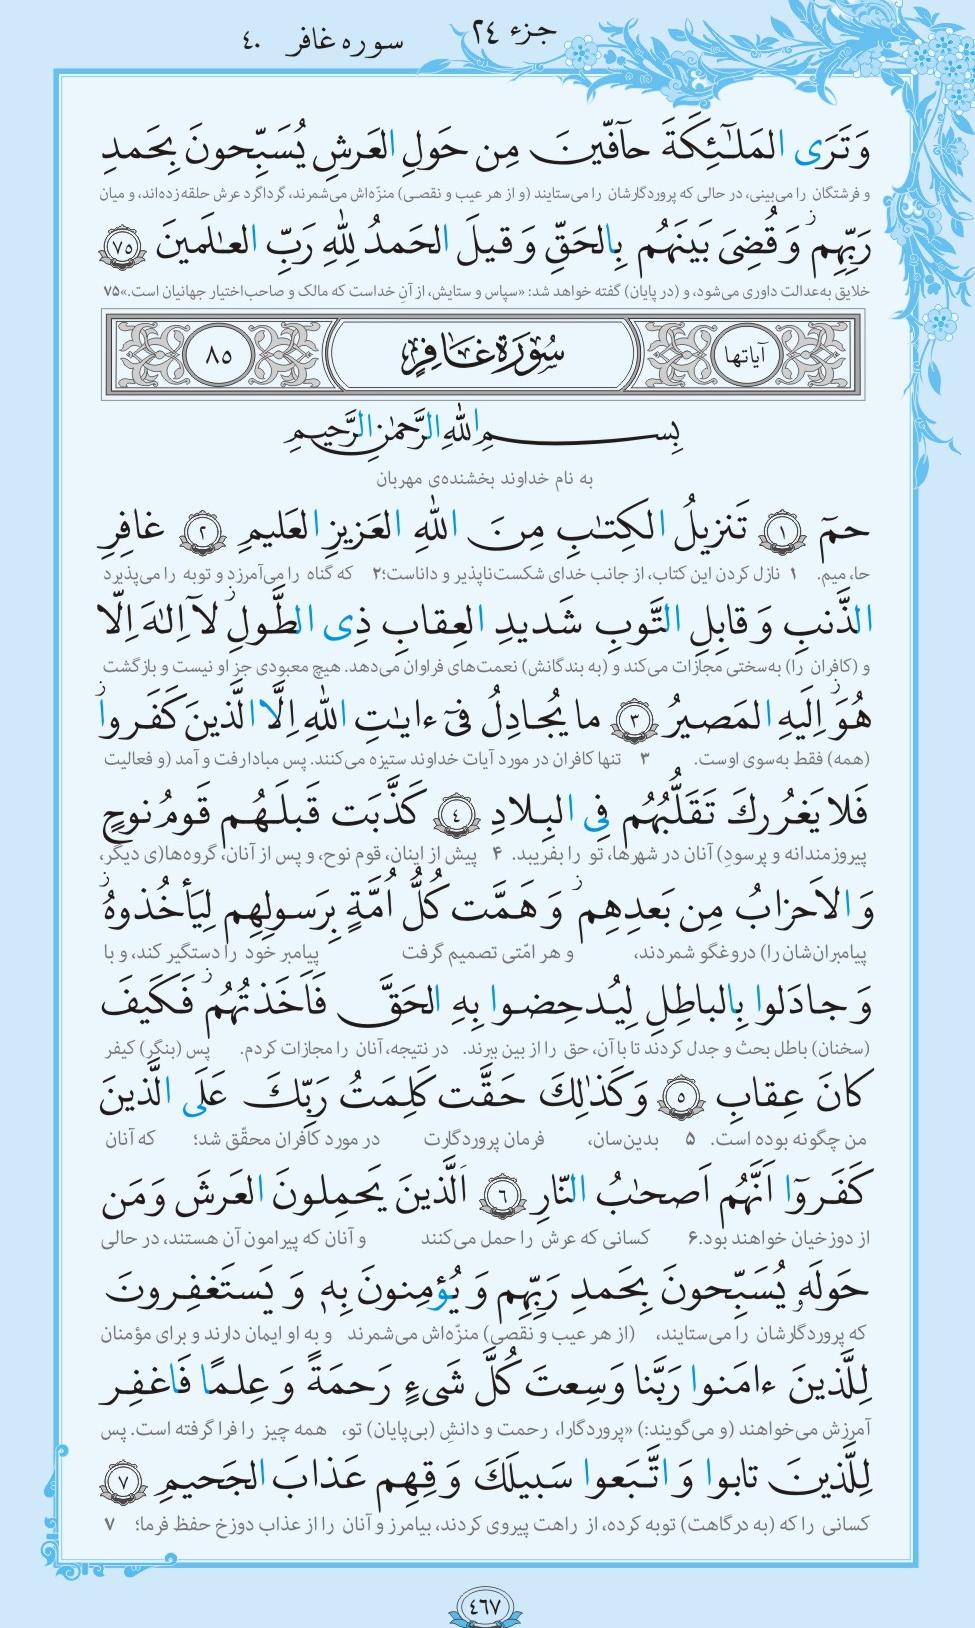 13990606000668 Test NewPhotoFree - ترتیل صفحه ۴۶۷ قرآن کریم+فیلم و متن آیات